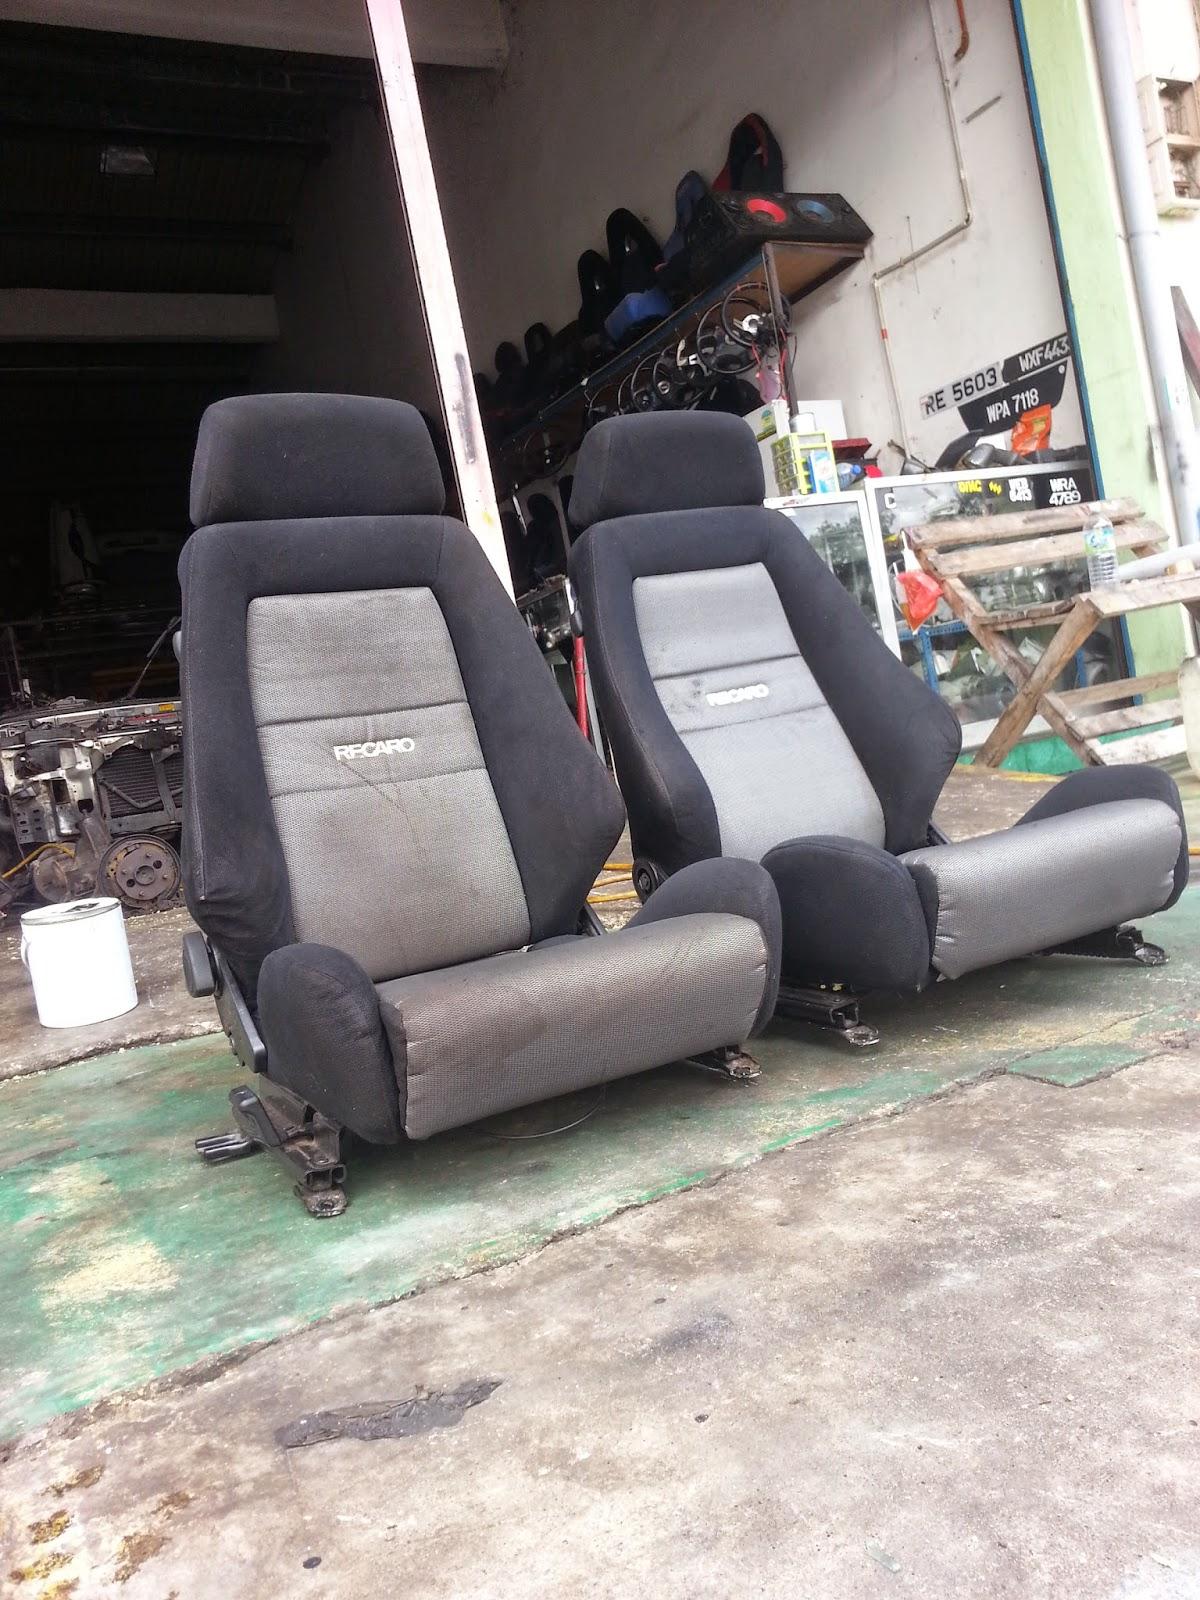 Dingz Garage Seat Recaro Satria Gti Complete